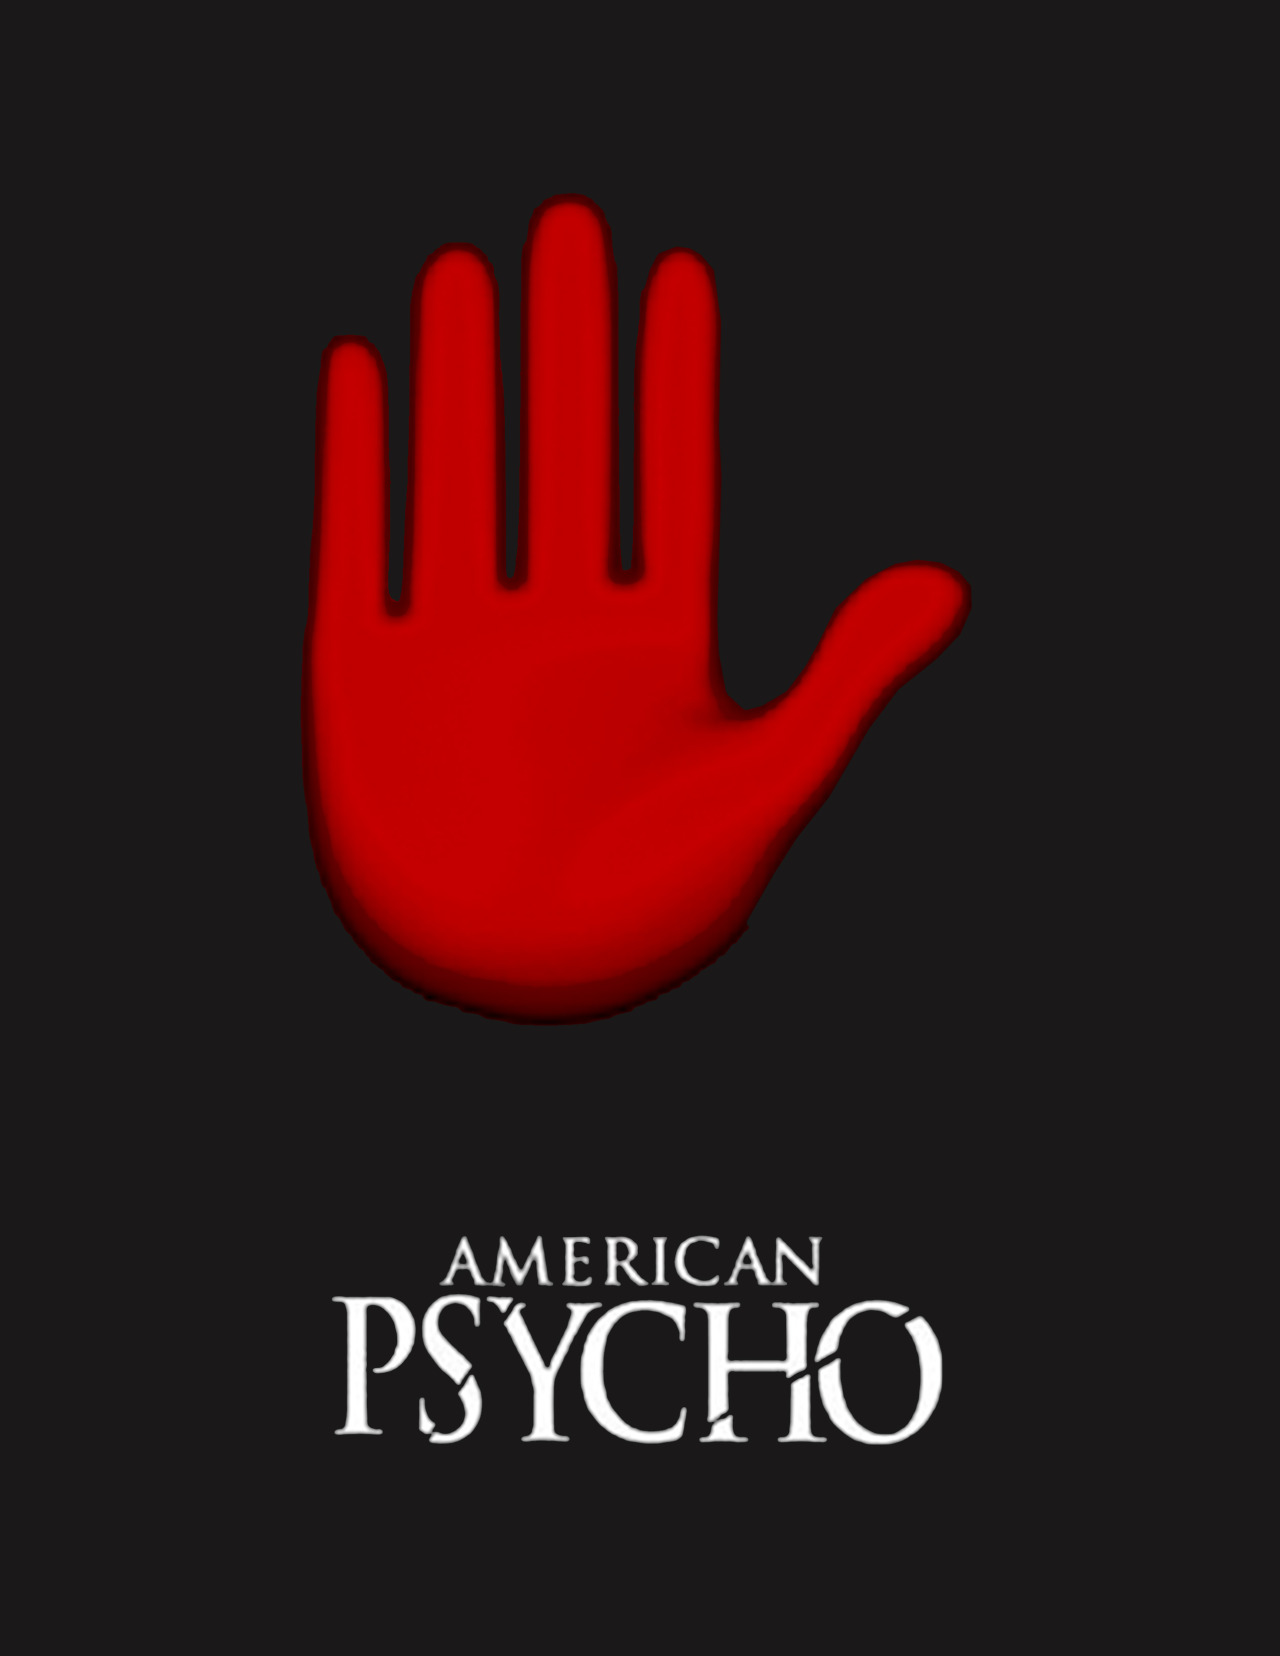 Американский психопат, Мэри Хэррон